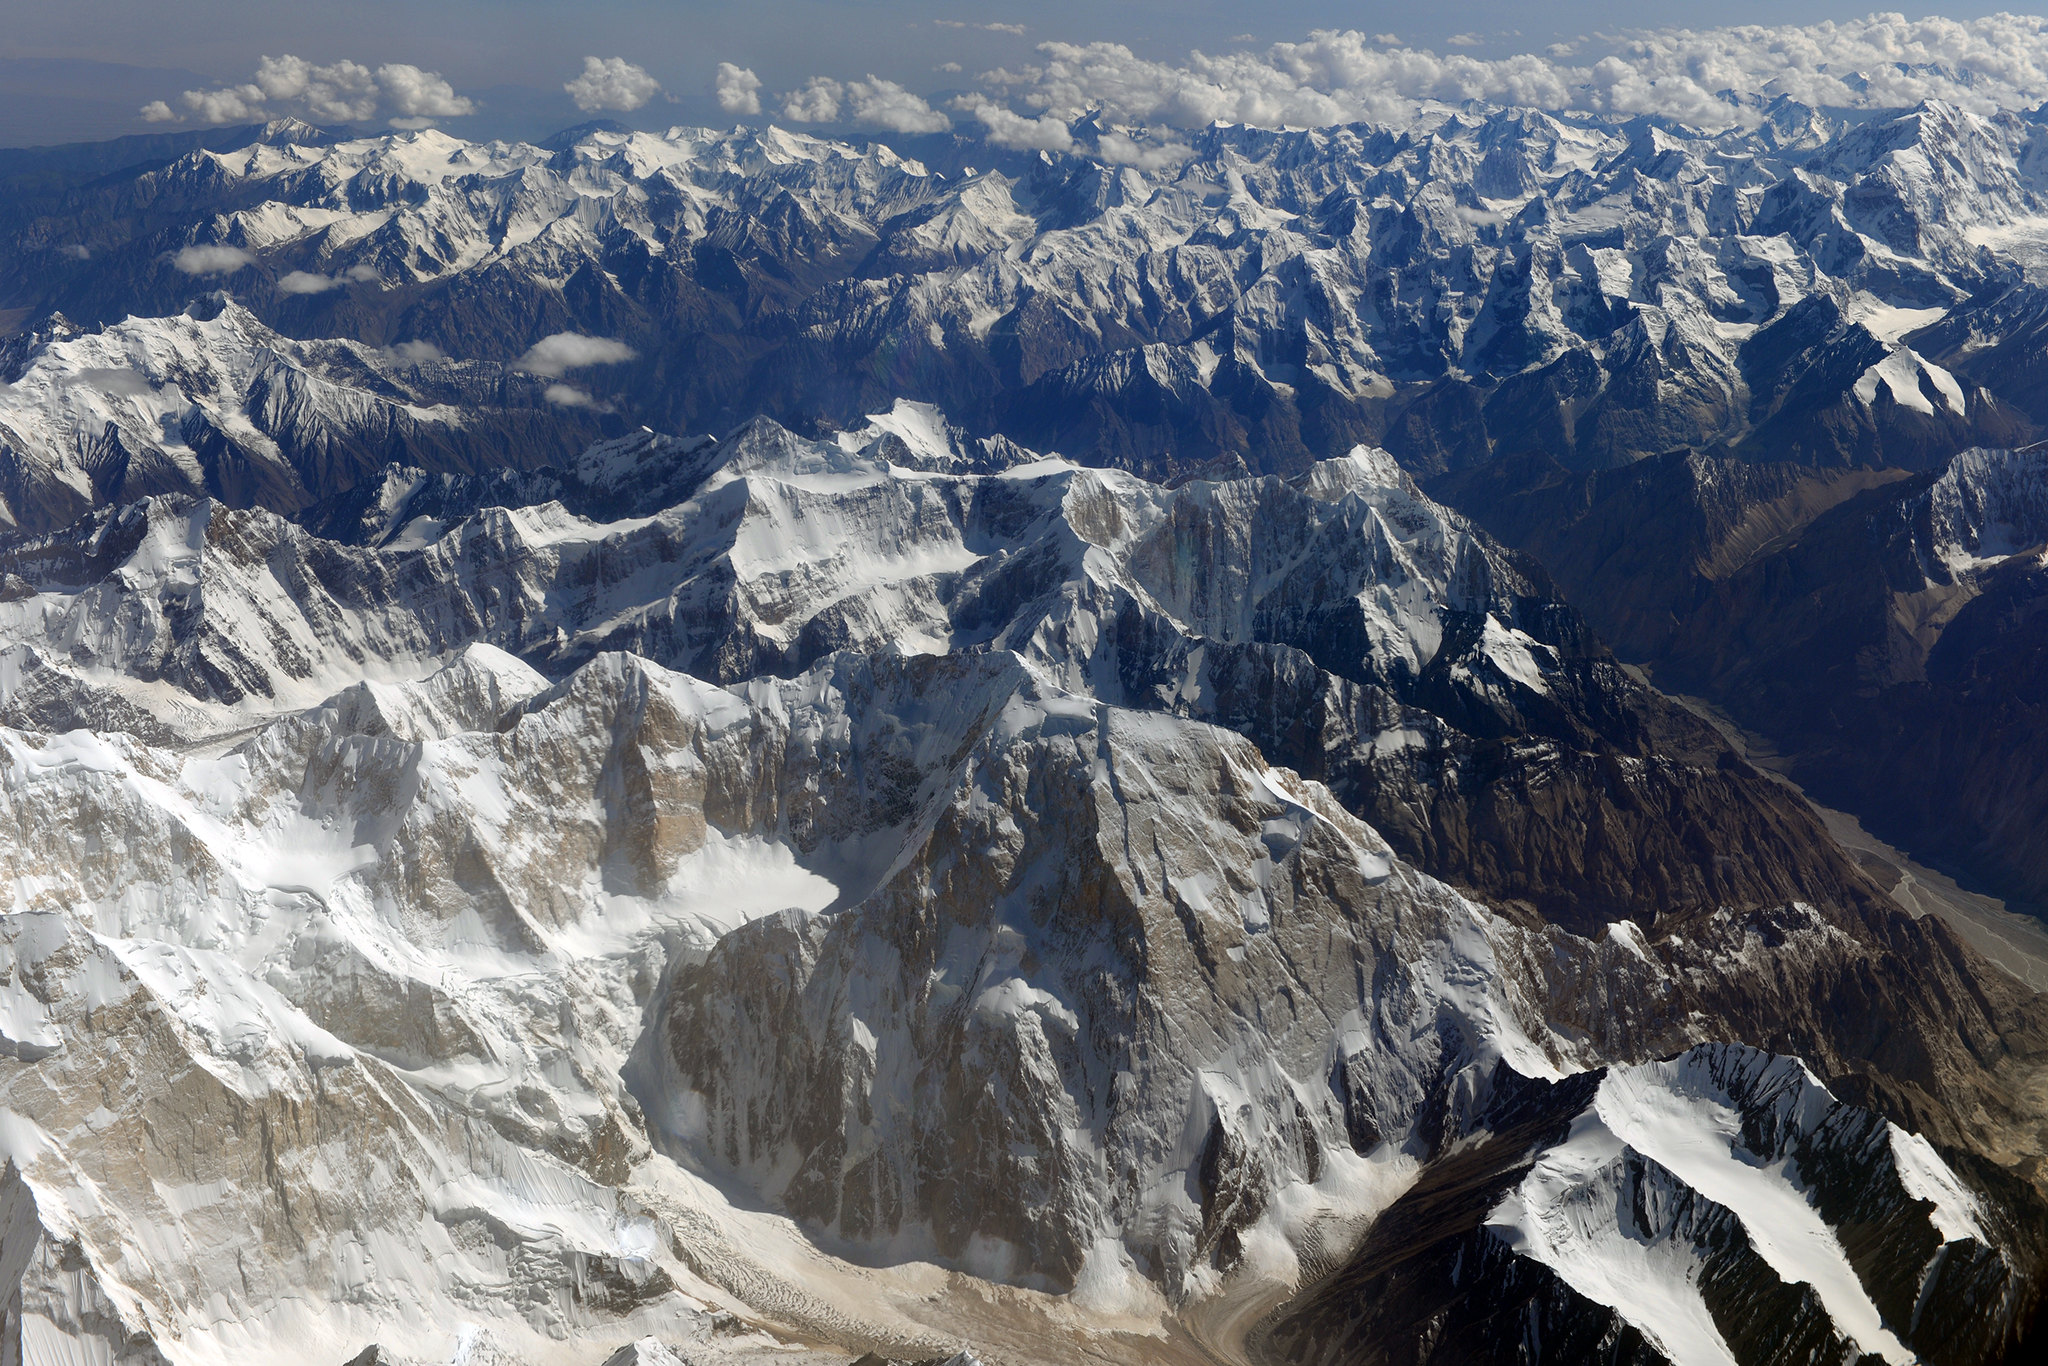 L888 – The Silk Road Airway